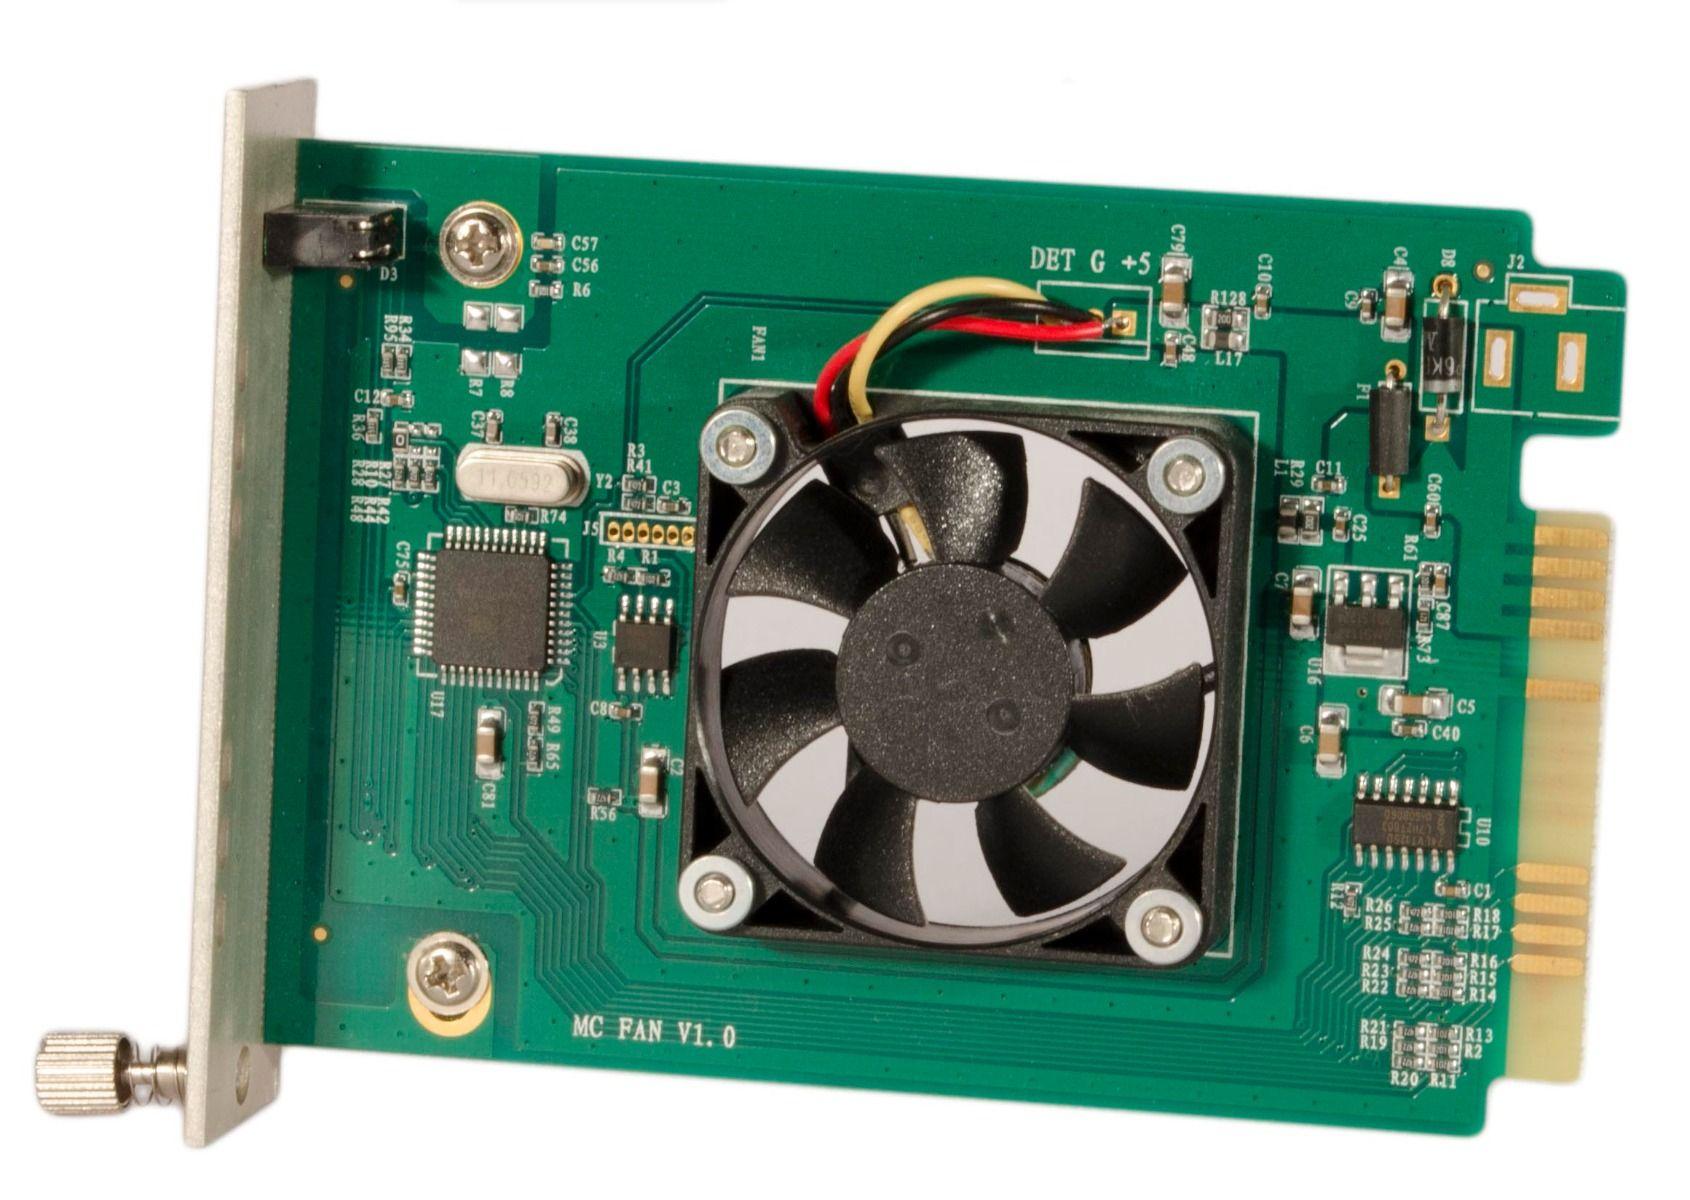 10G Fiber Media Converter Card – XFP and RJ45 Ports